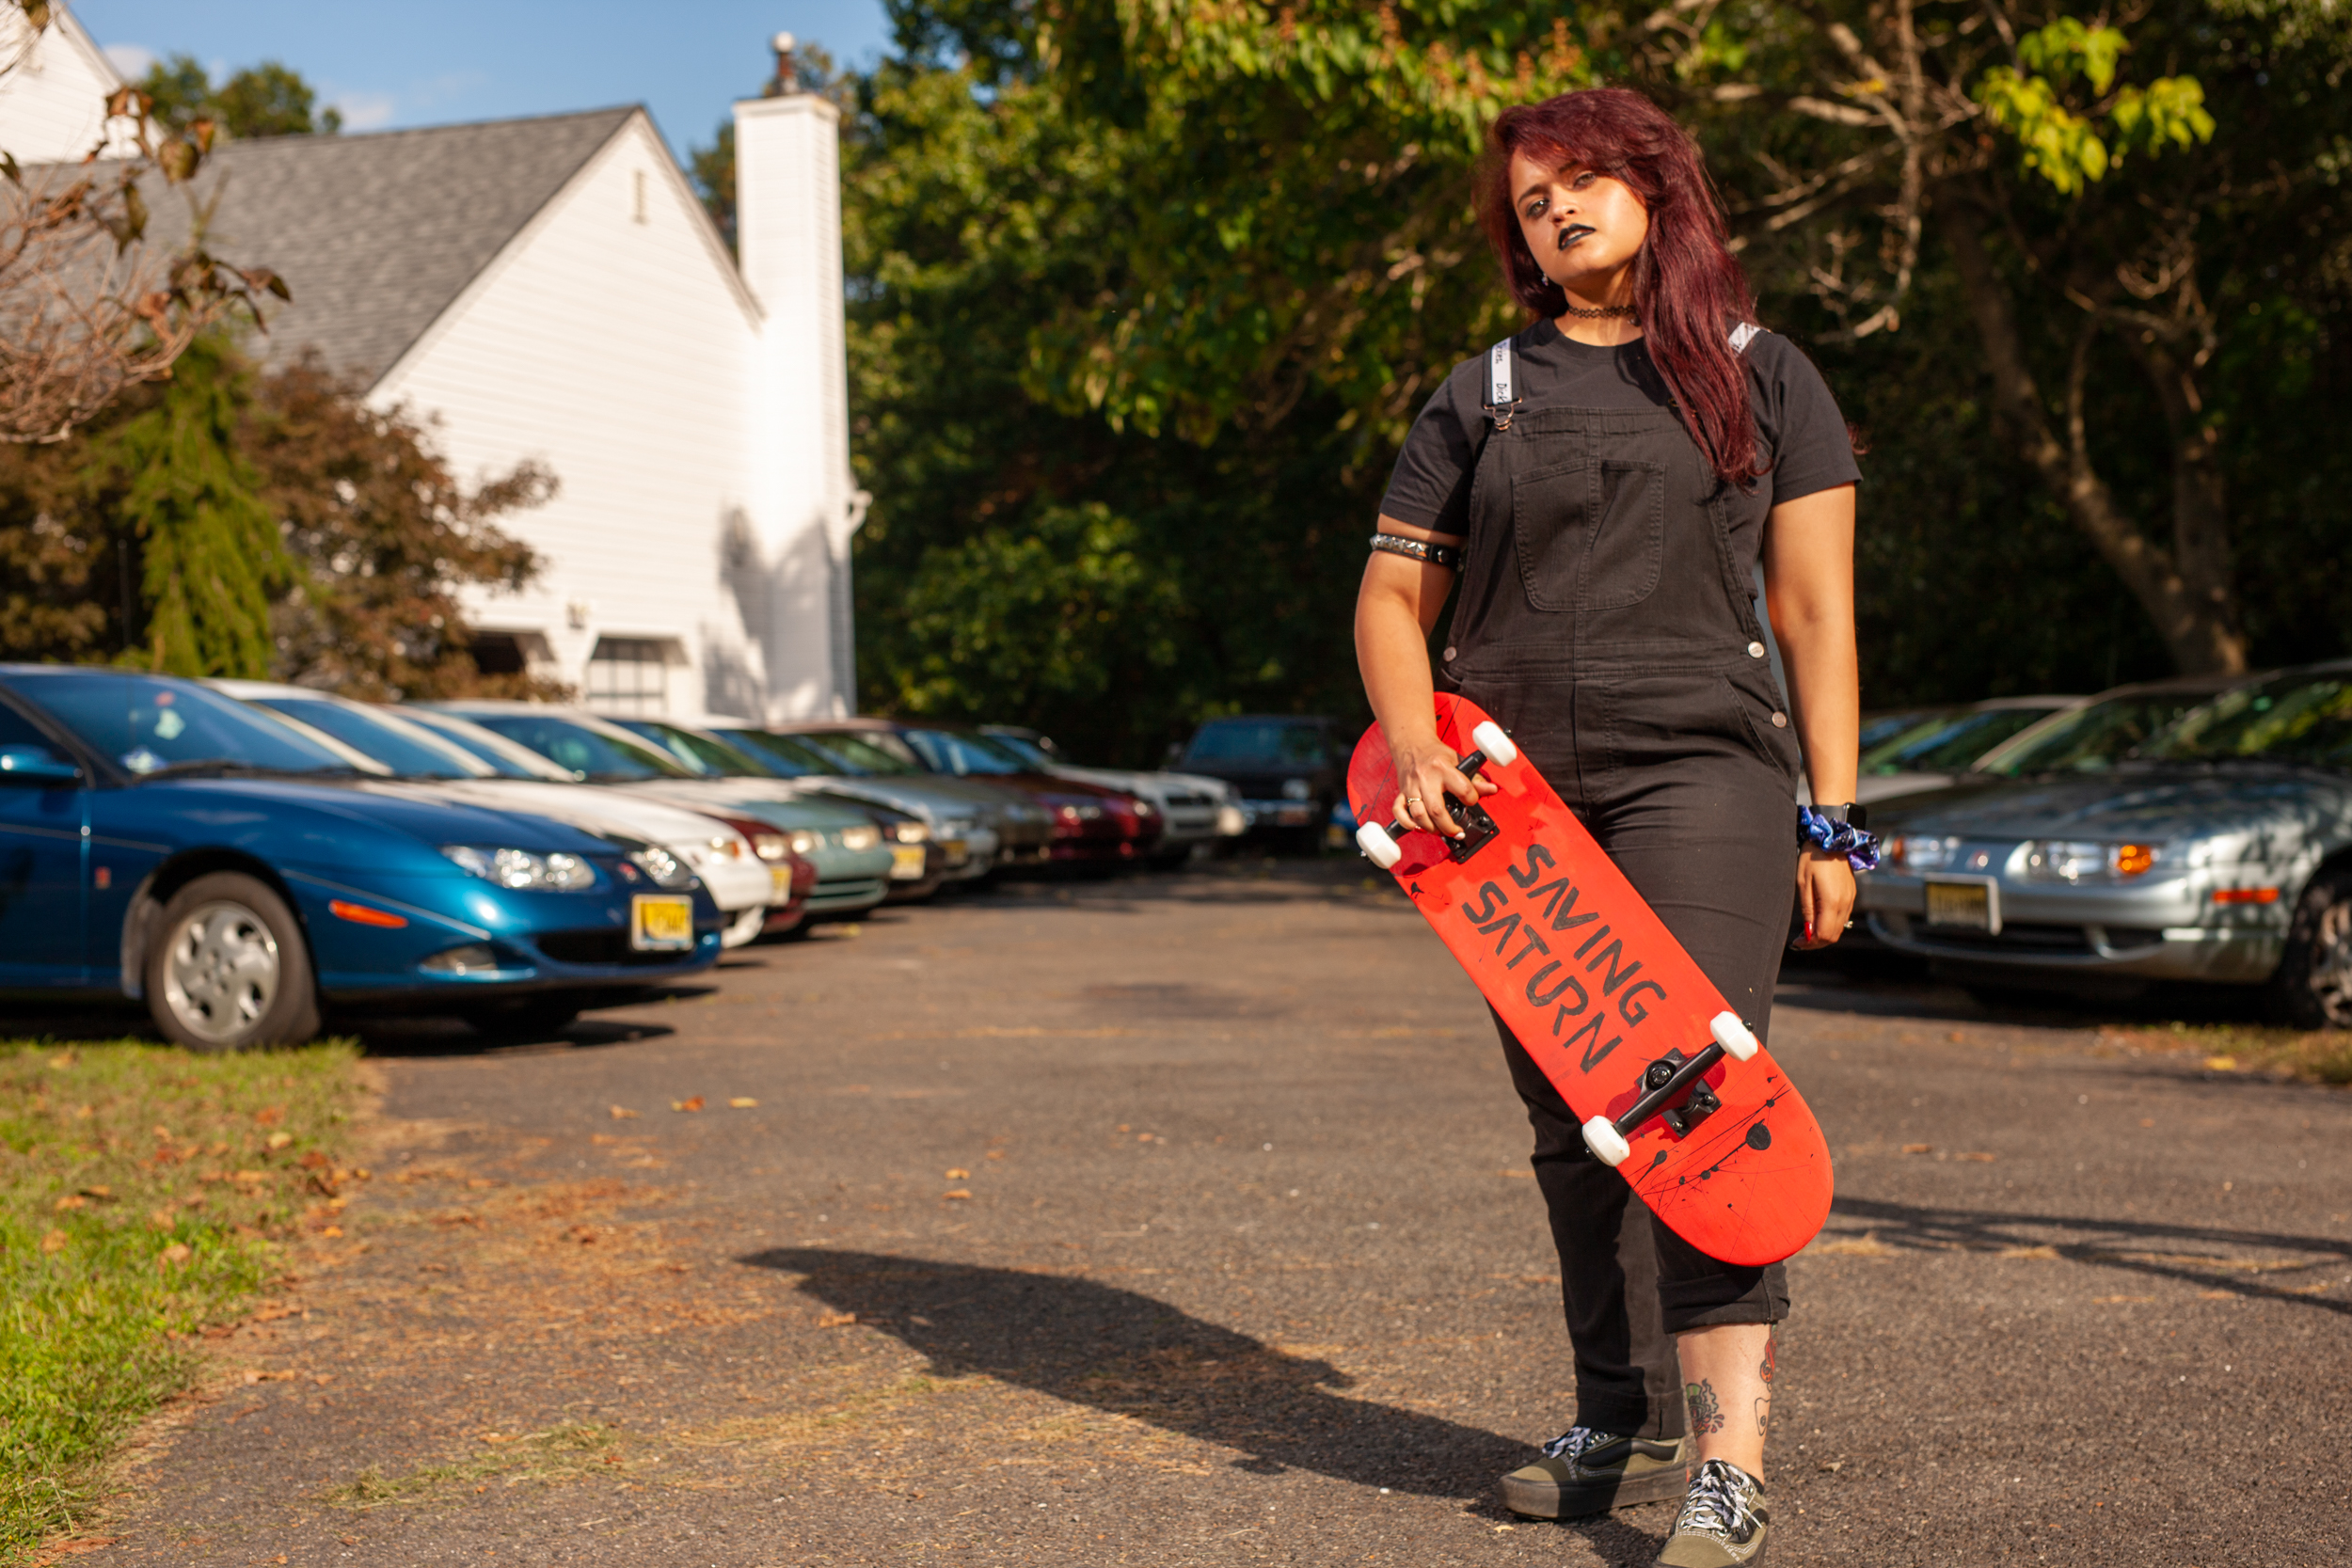 saturn enthusiast jessie skateboard standing profile